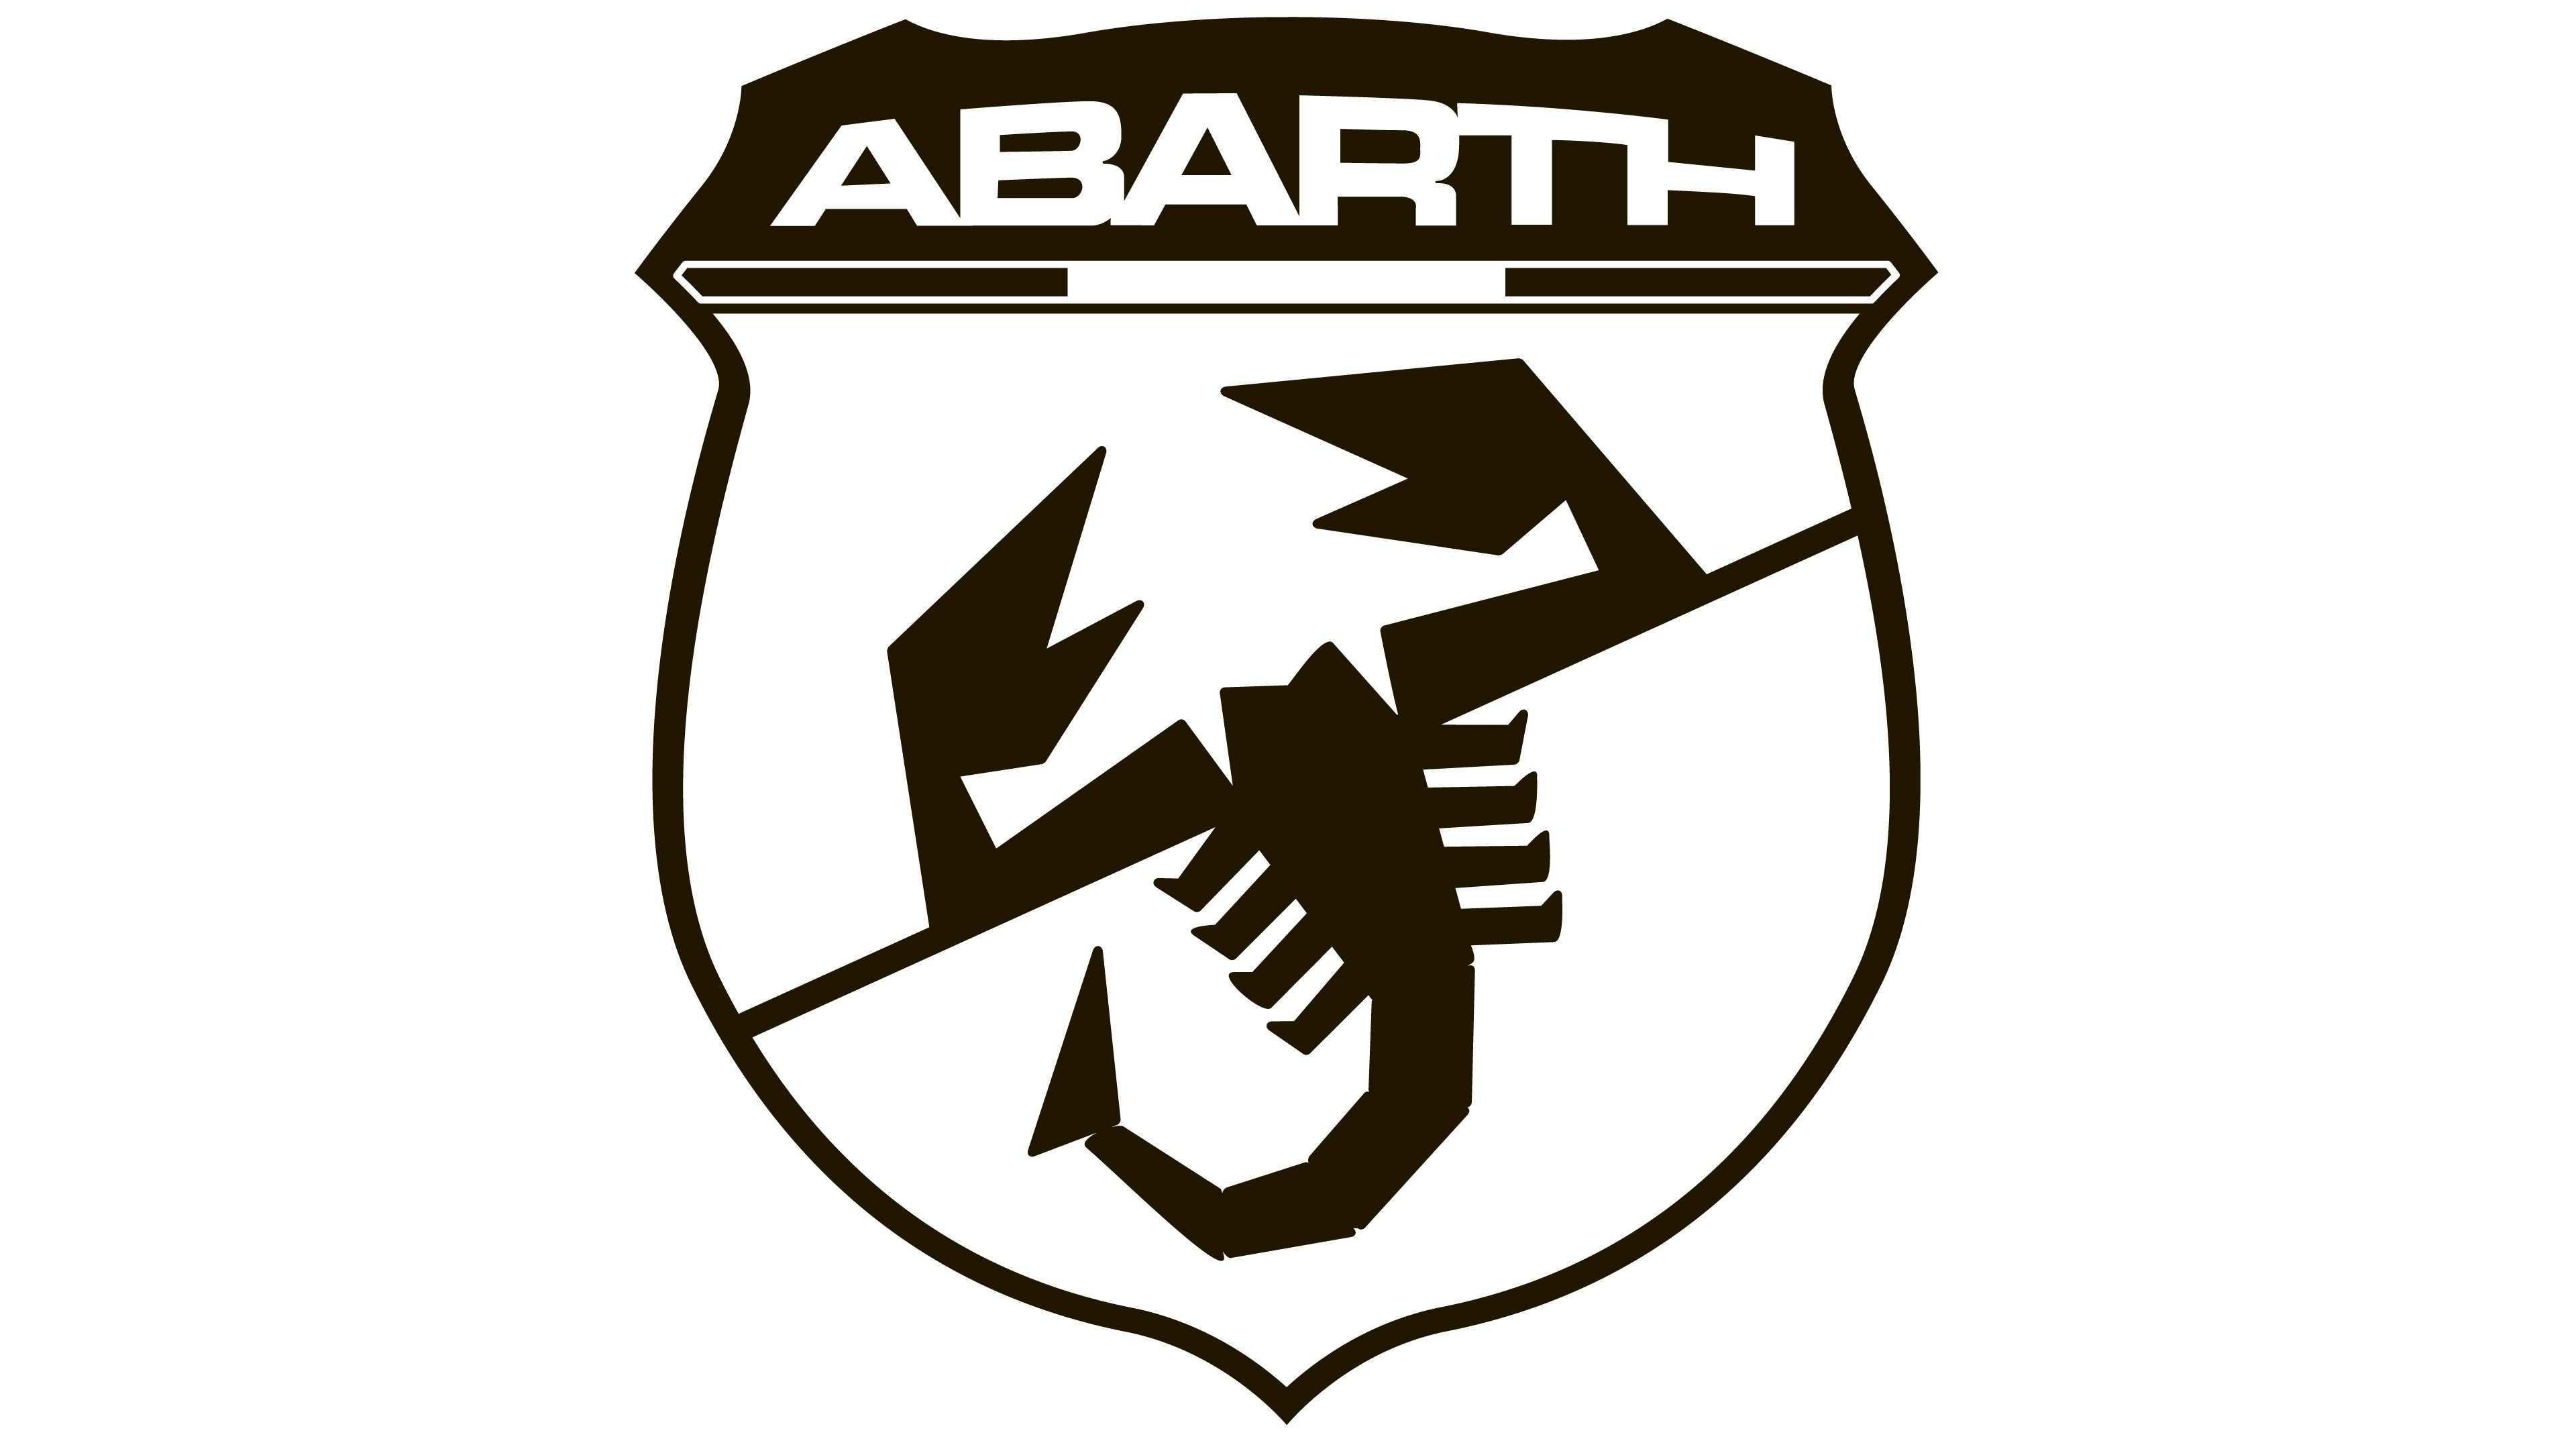 Fiat Abarth Emblem Abarth Logo Emblem